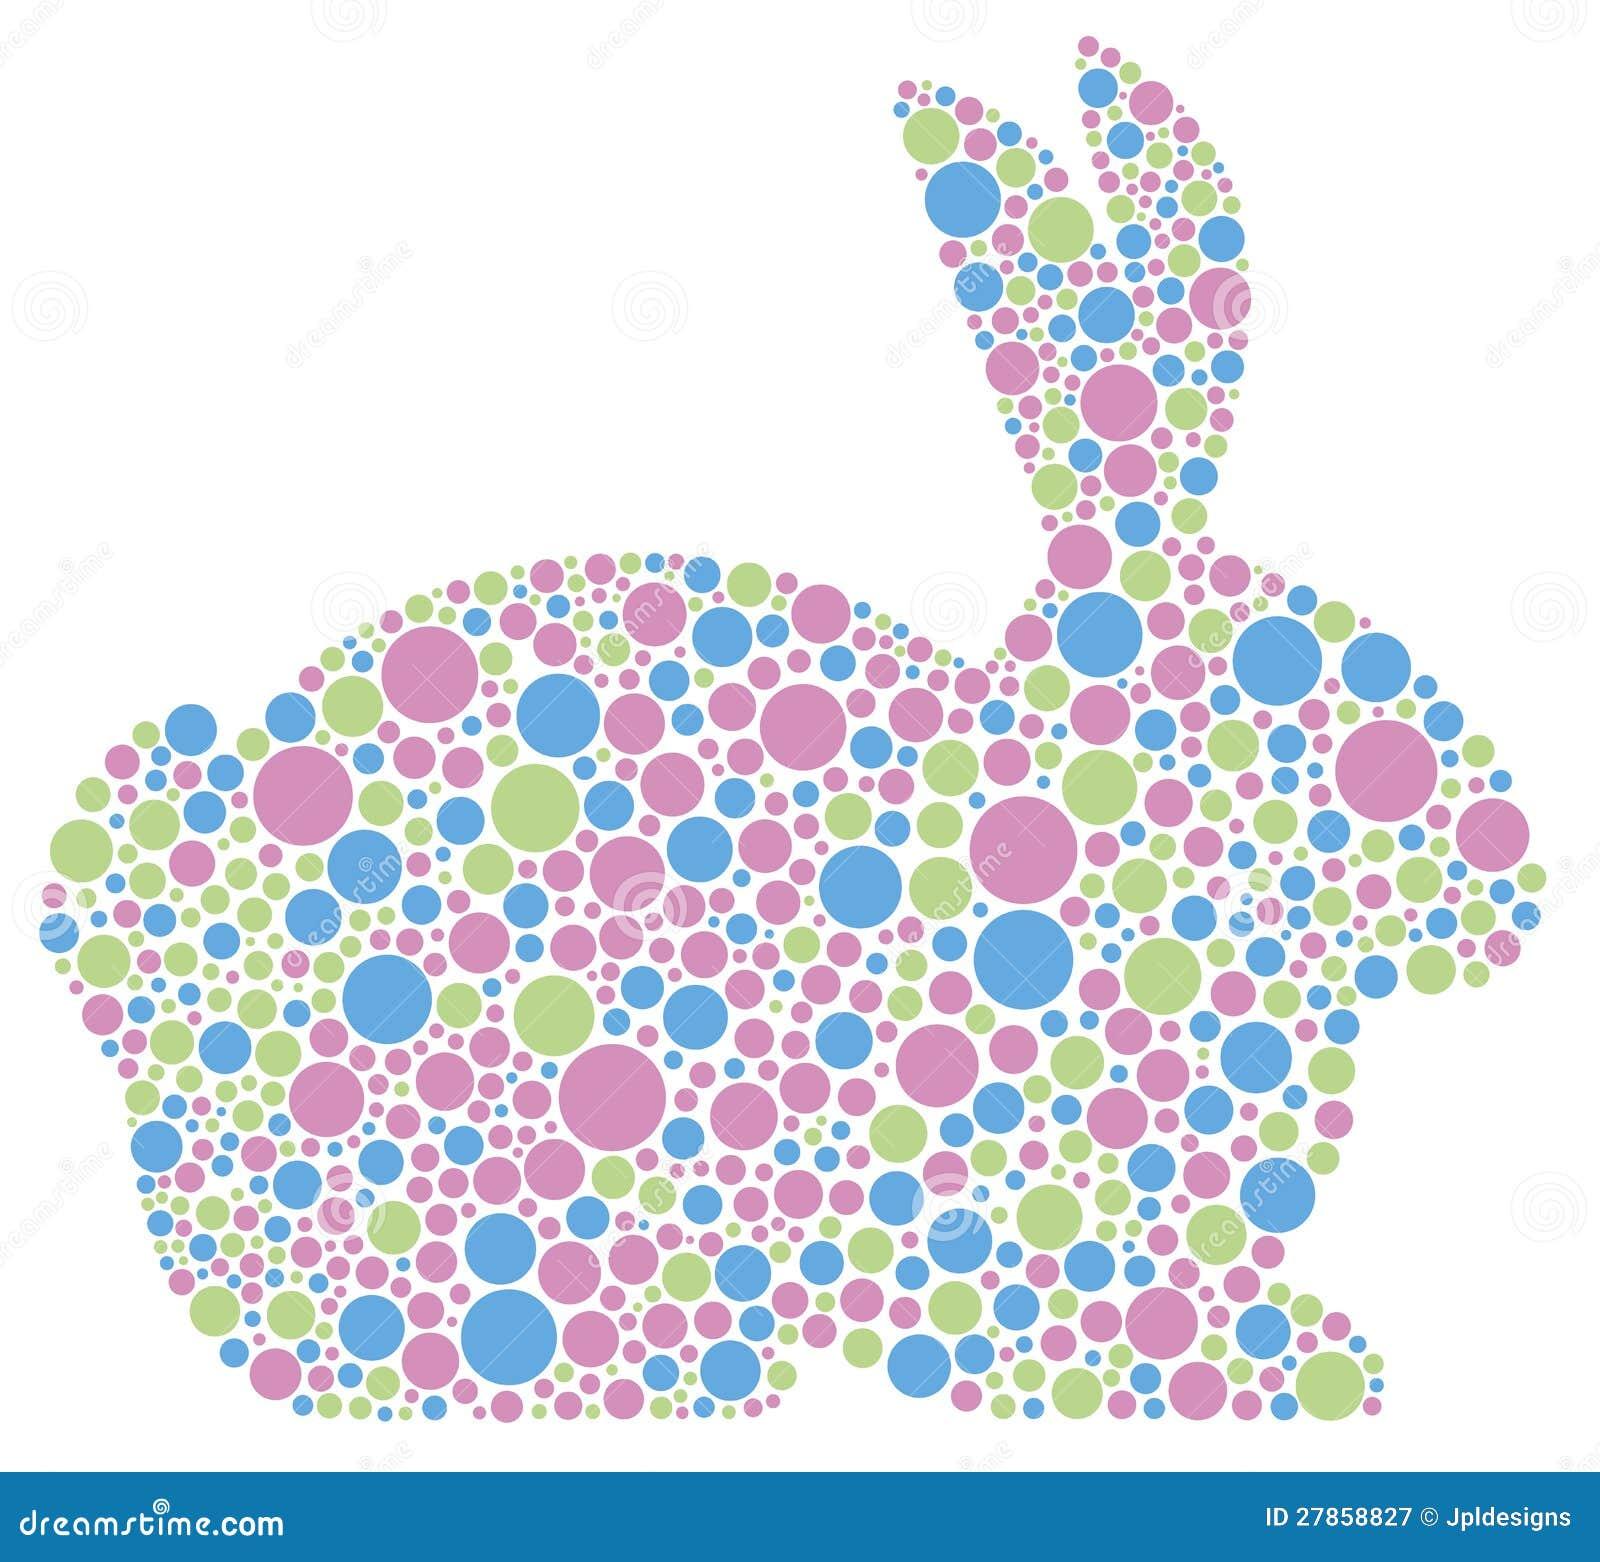 W Polek Pastelowych Kropkach królika Królik